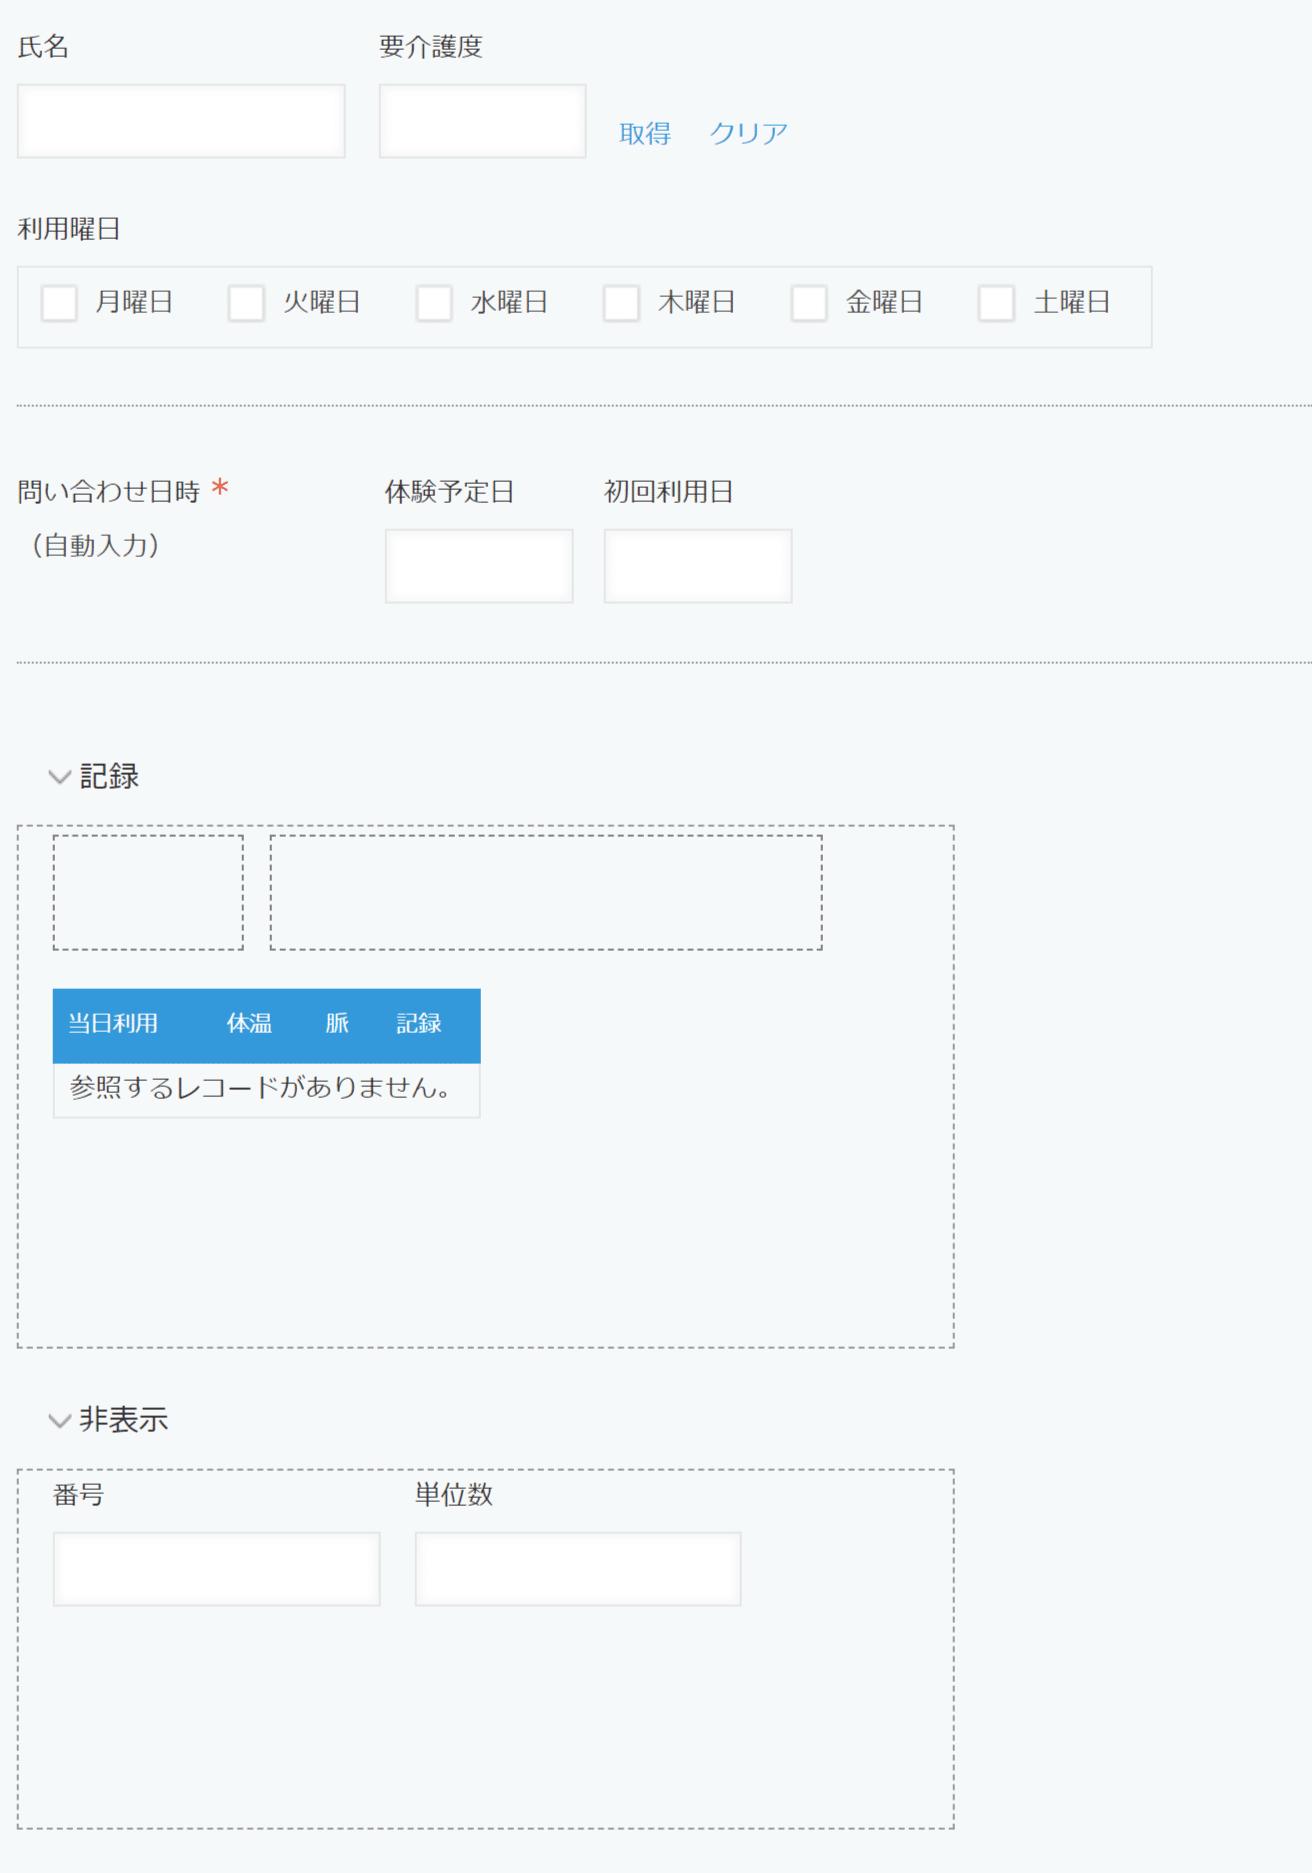 kintoneアプリフォームイメージ